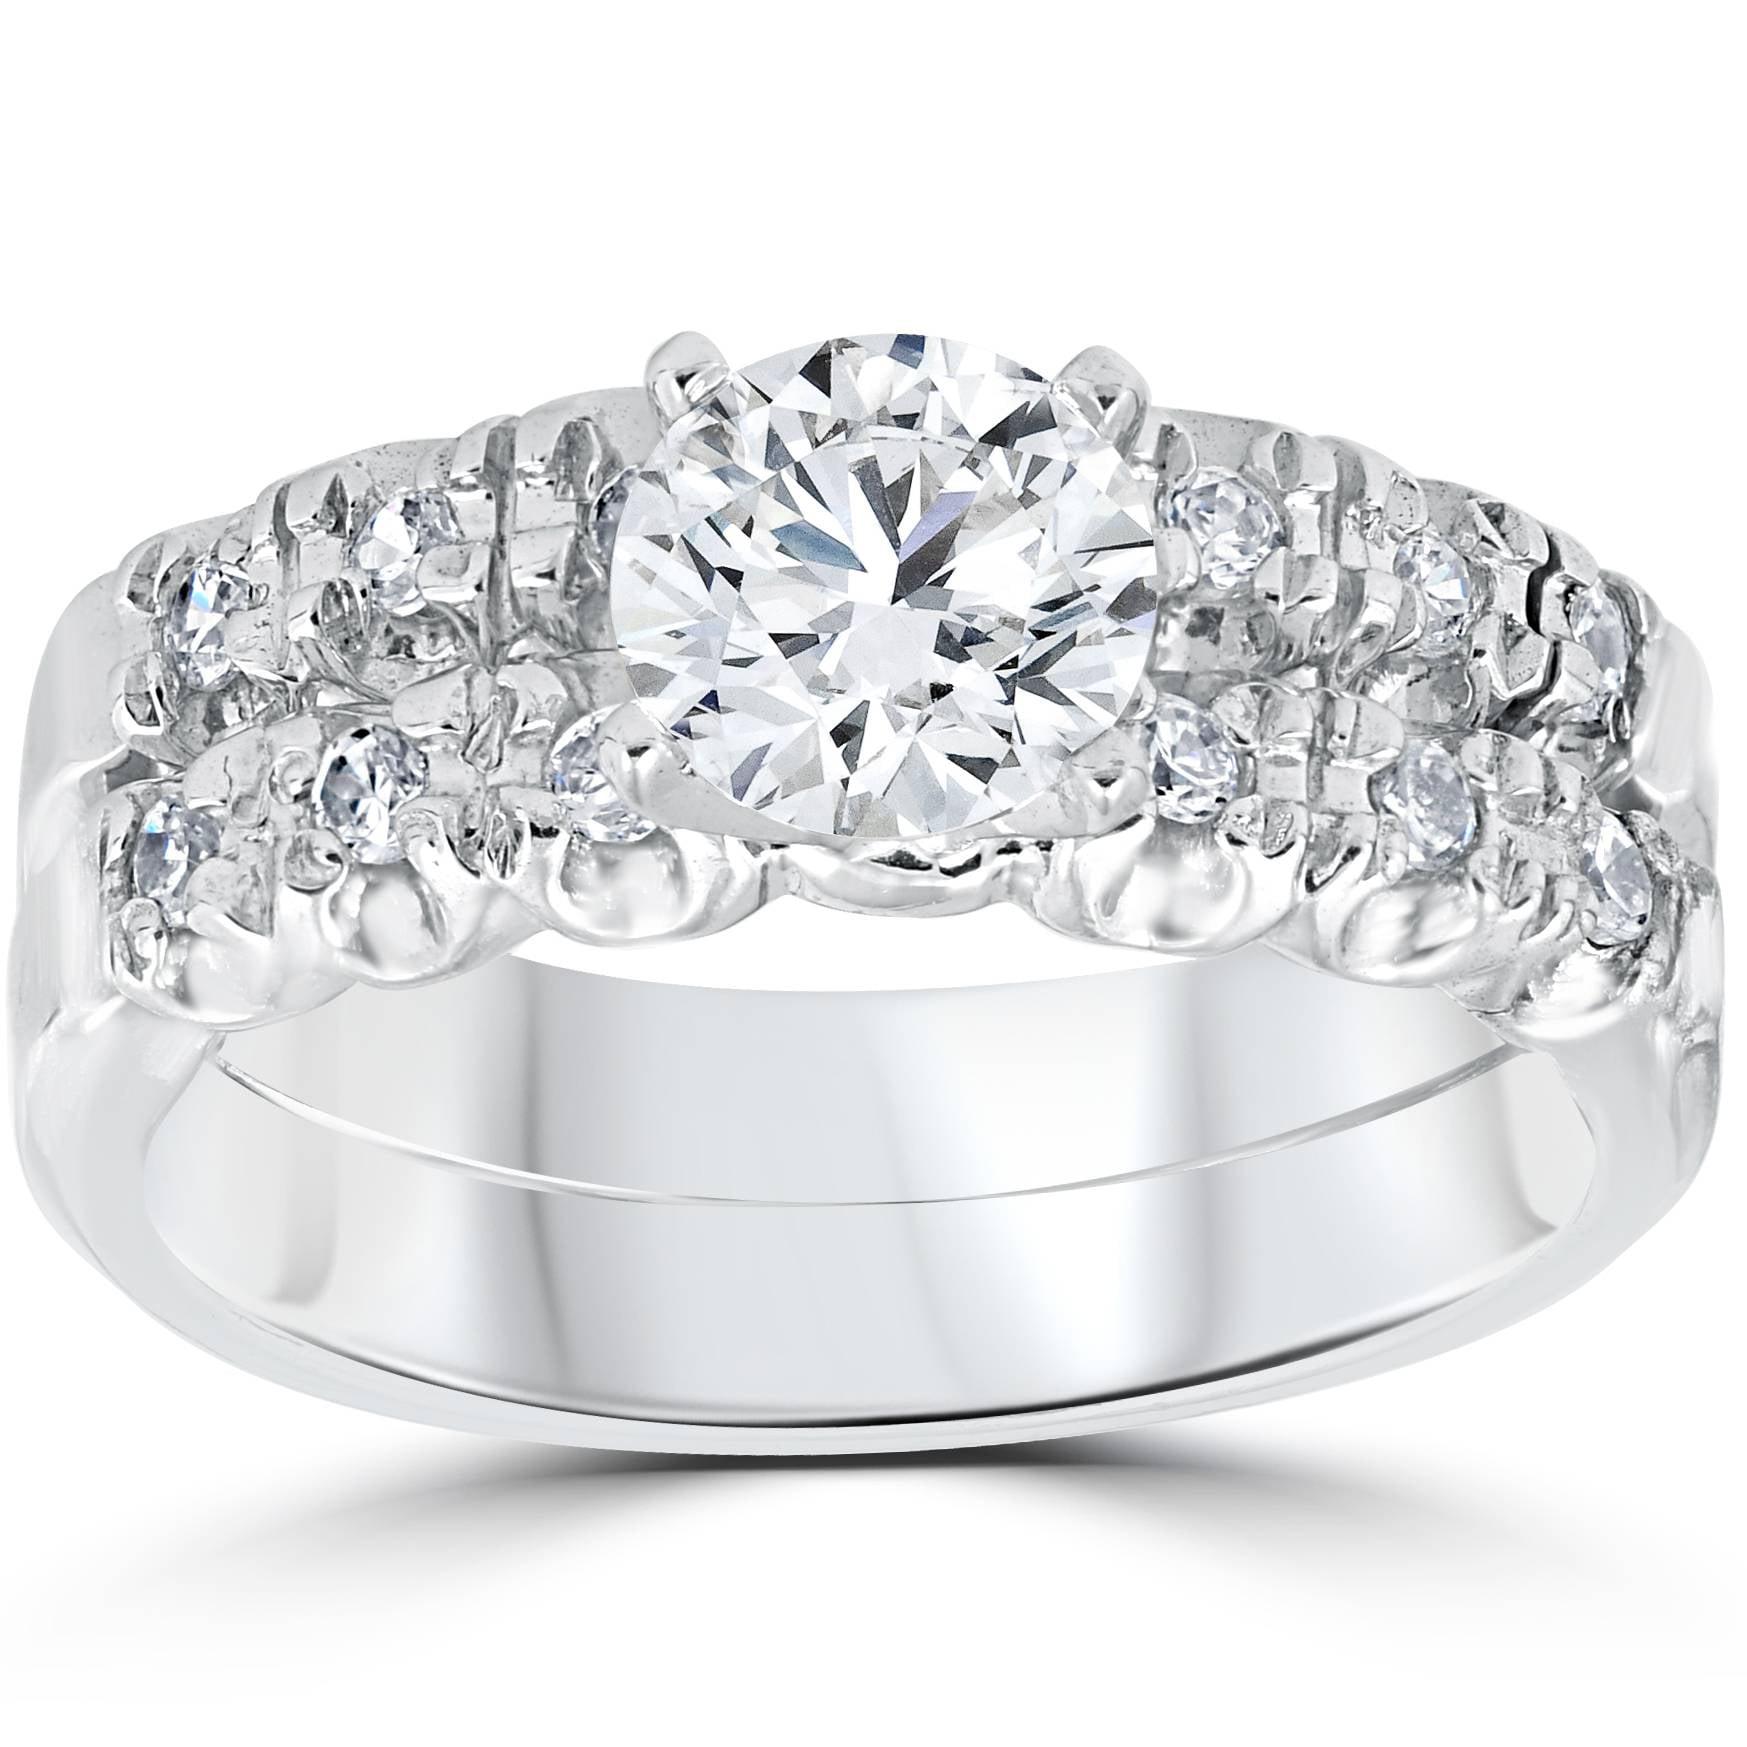 1 Carat Diamond Engagement Ring Matching Wedding Band Prong Set 14K White Gold by Pompeii3